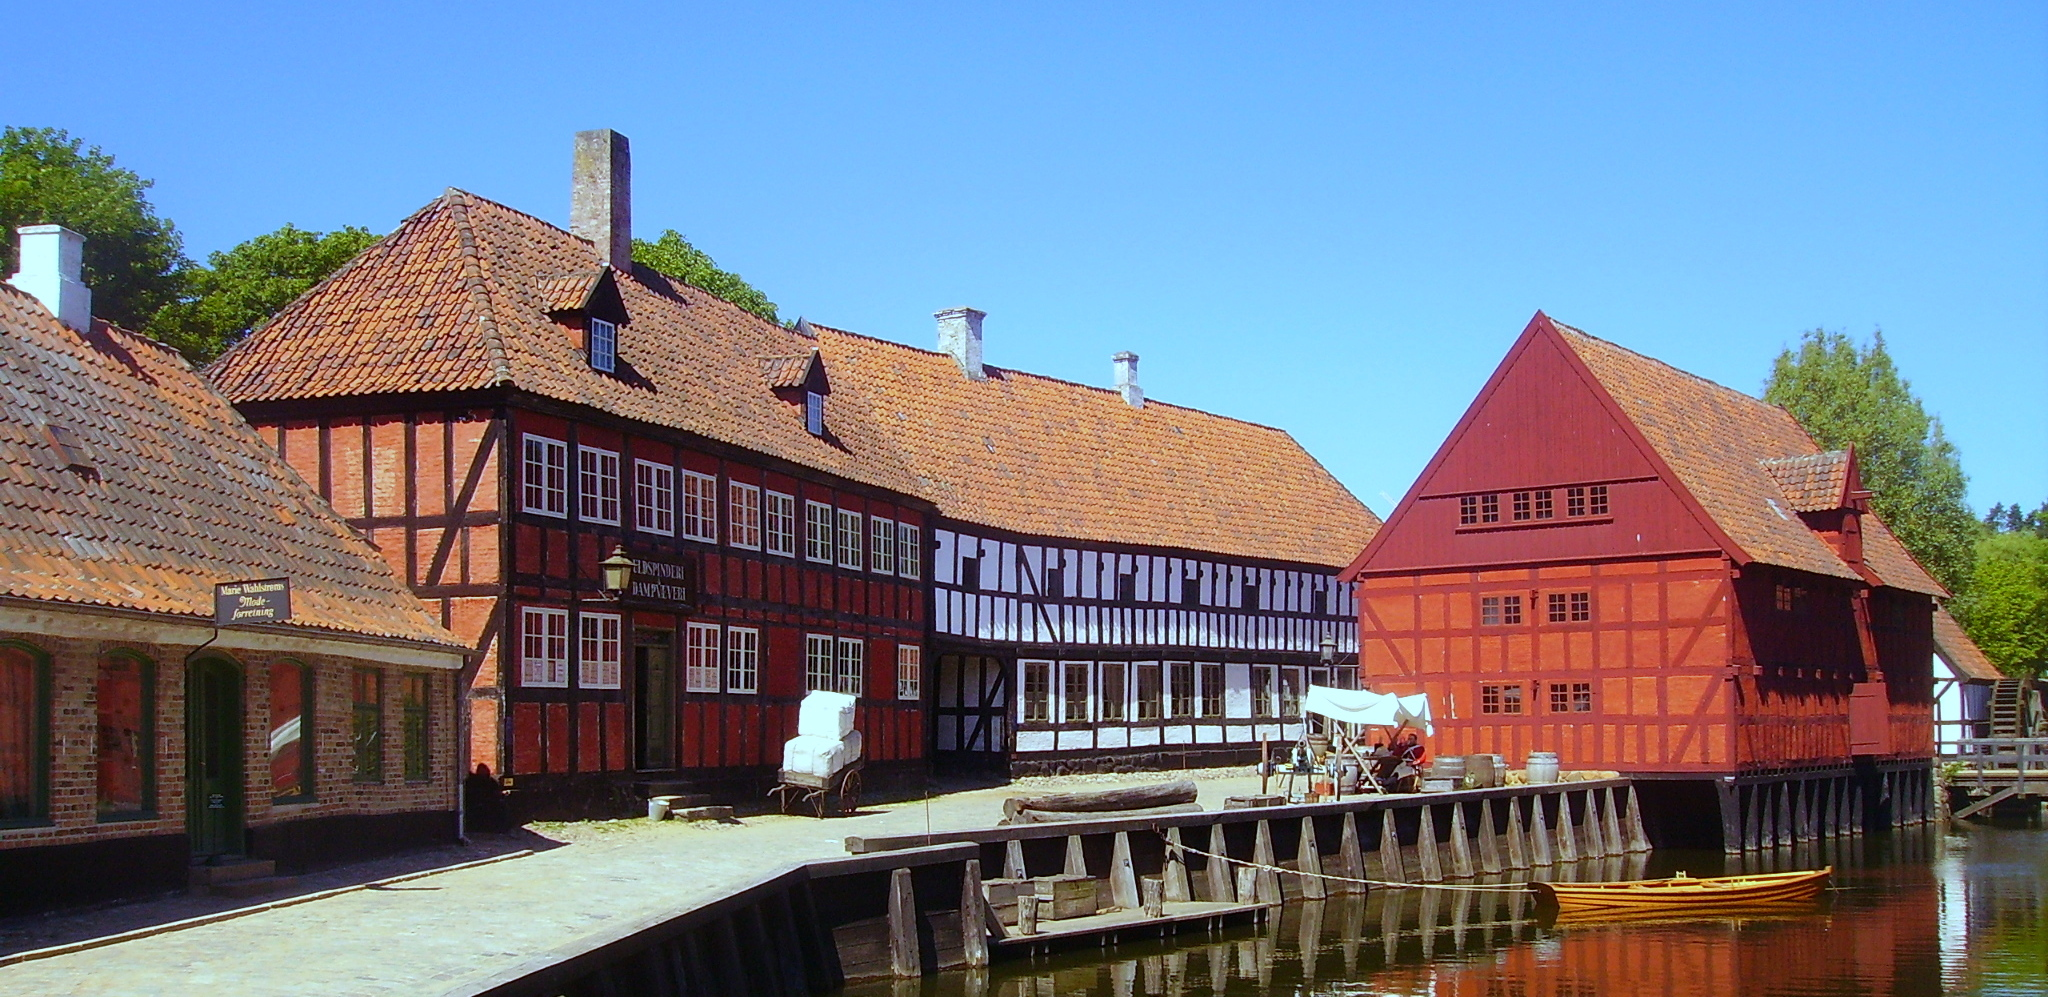 Https Commons Wikimedia Org Wiki File Aarhus Den Gamle By 16 Jpg